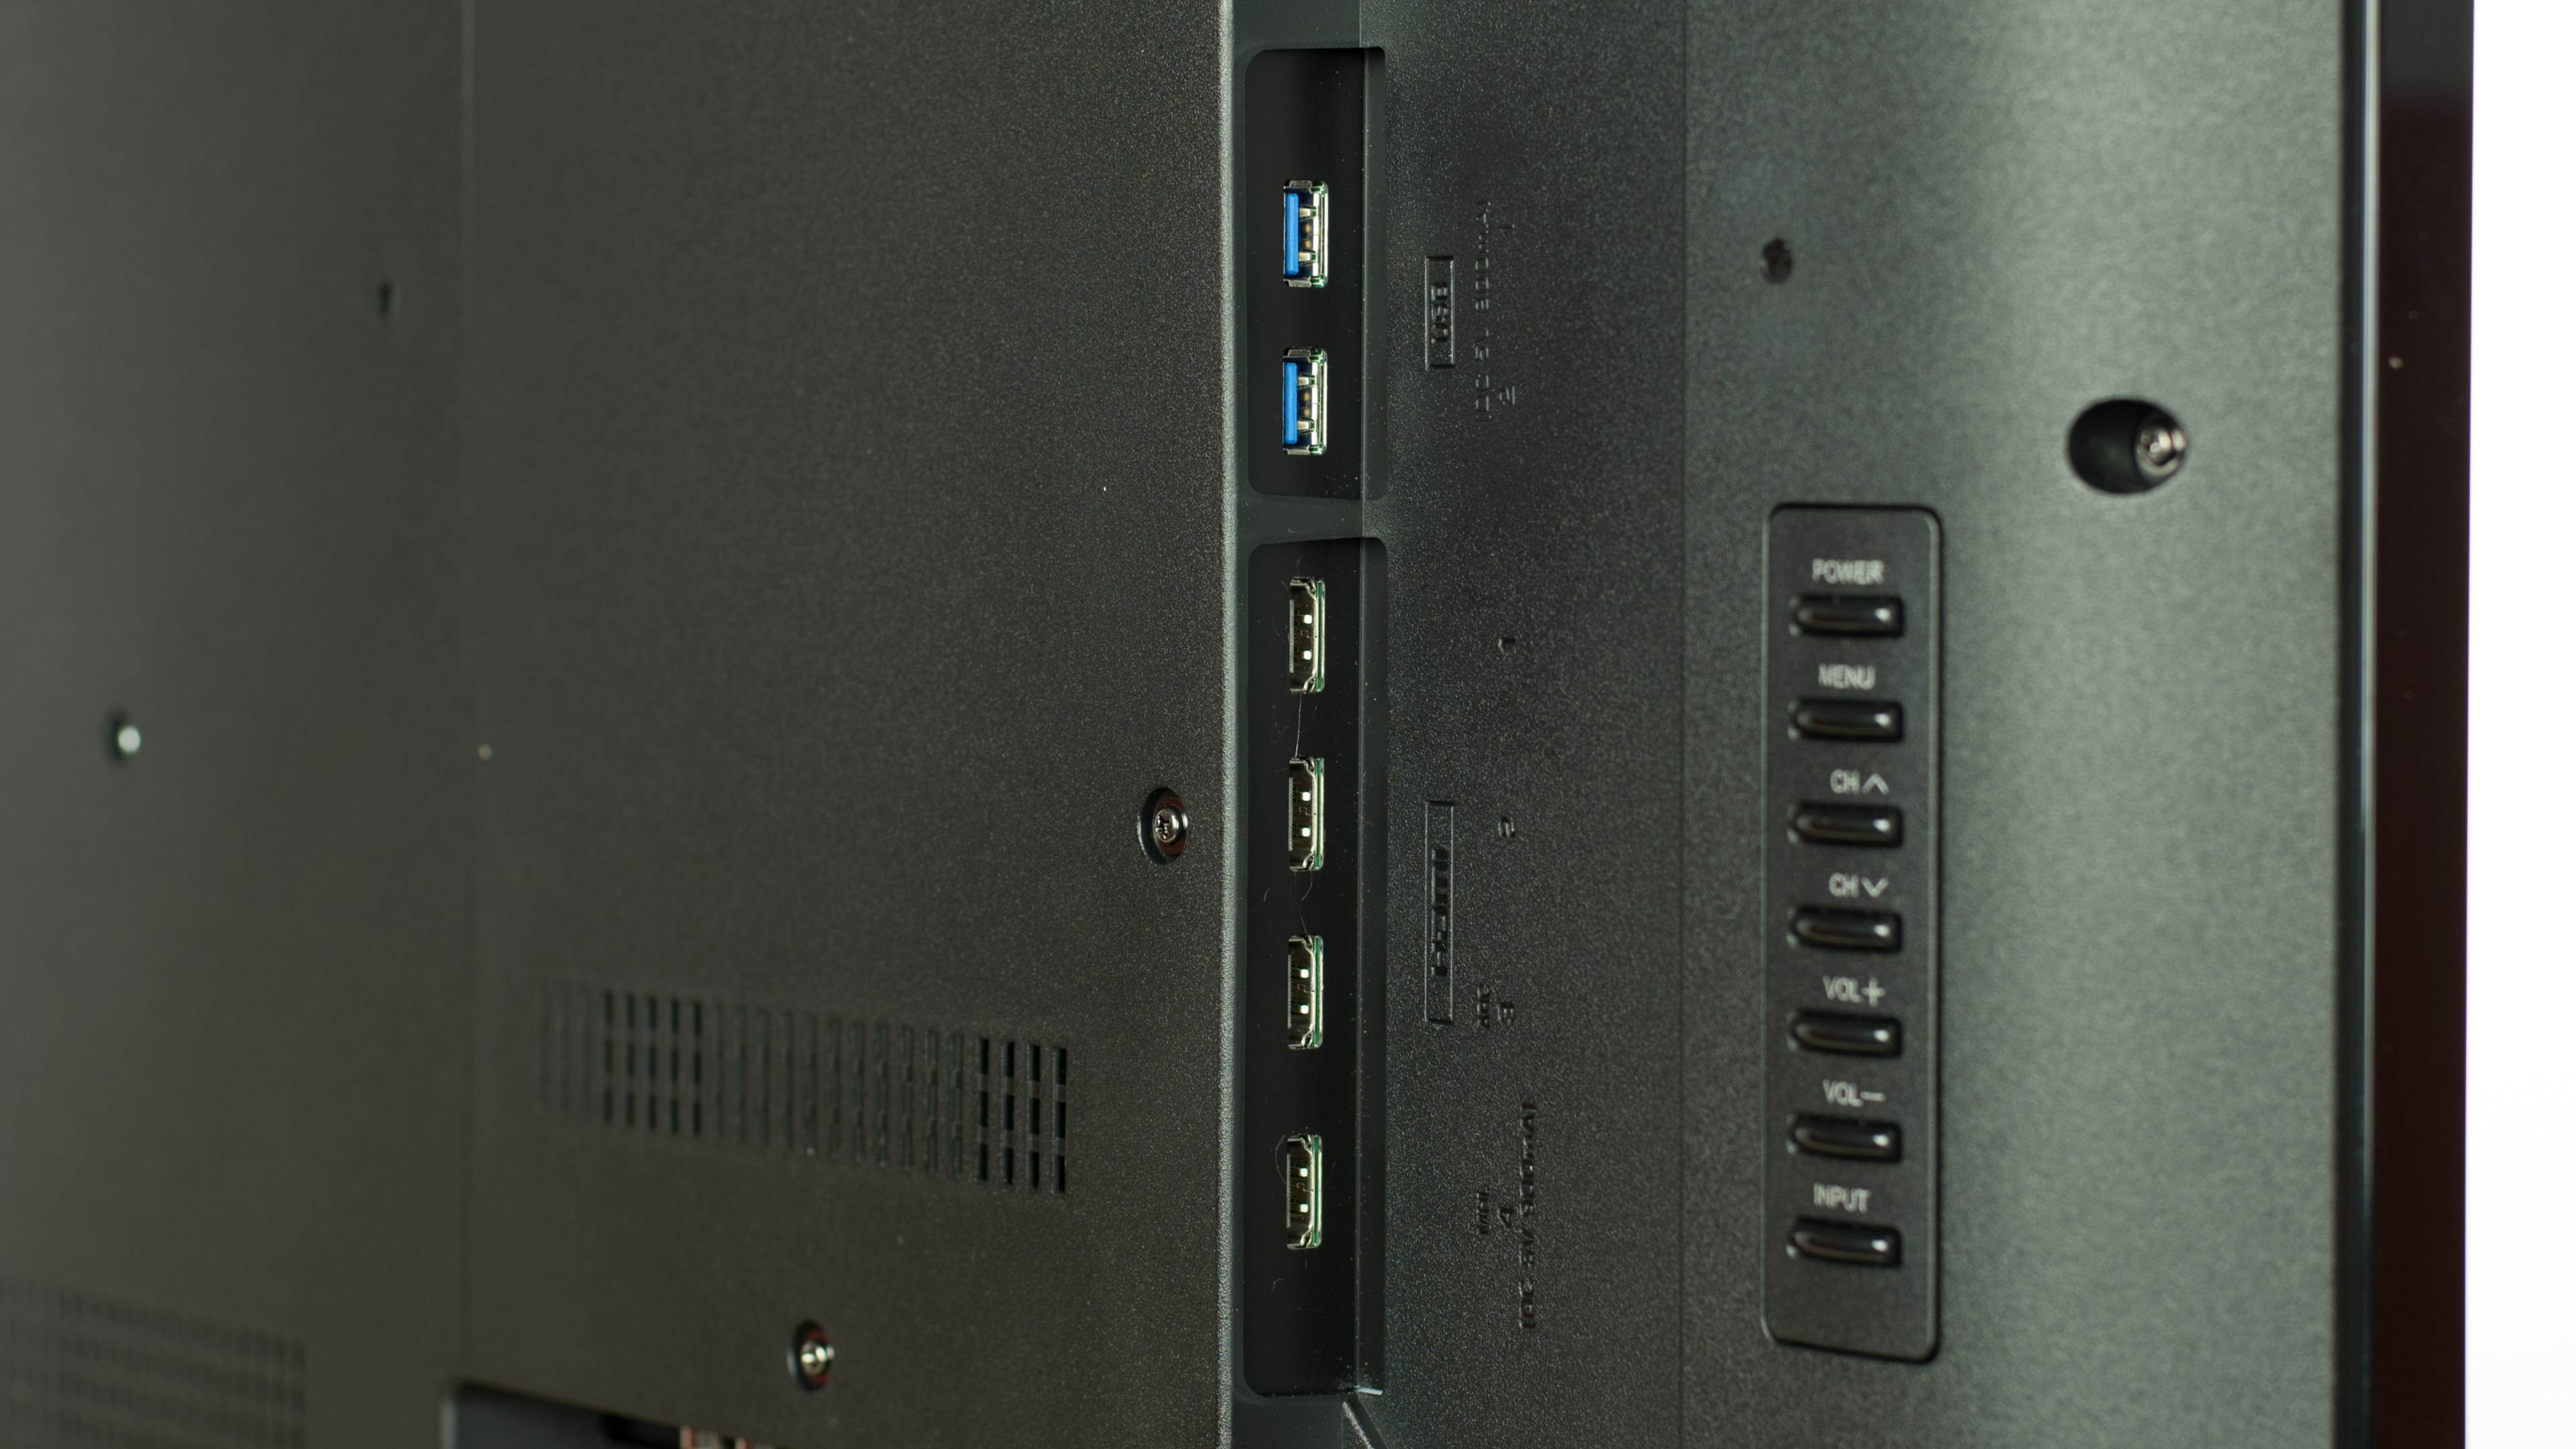 Sharp Ub30u Review Lc 43ub30u Lc 50ub30u Lc 55ub30u Lc